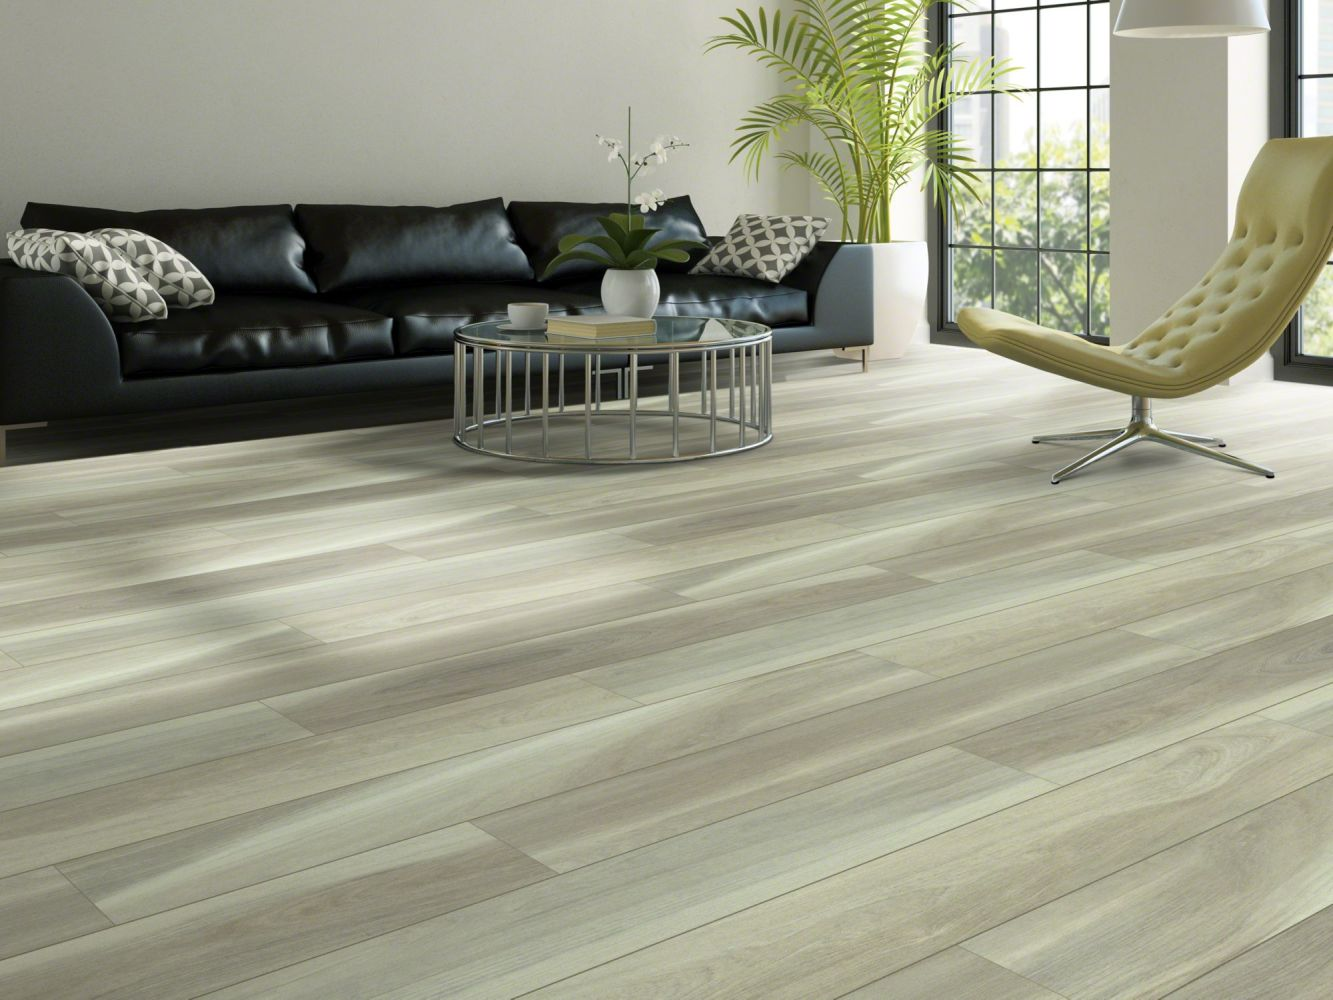 Shaw Floors Resilient Residential Whiskey Oak 720c Plus Appalachian Oak 00169_516SA